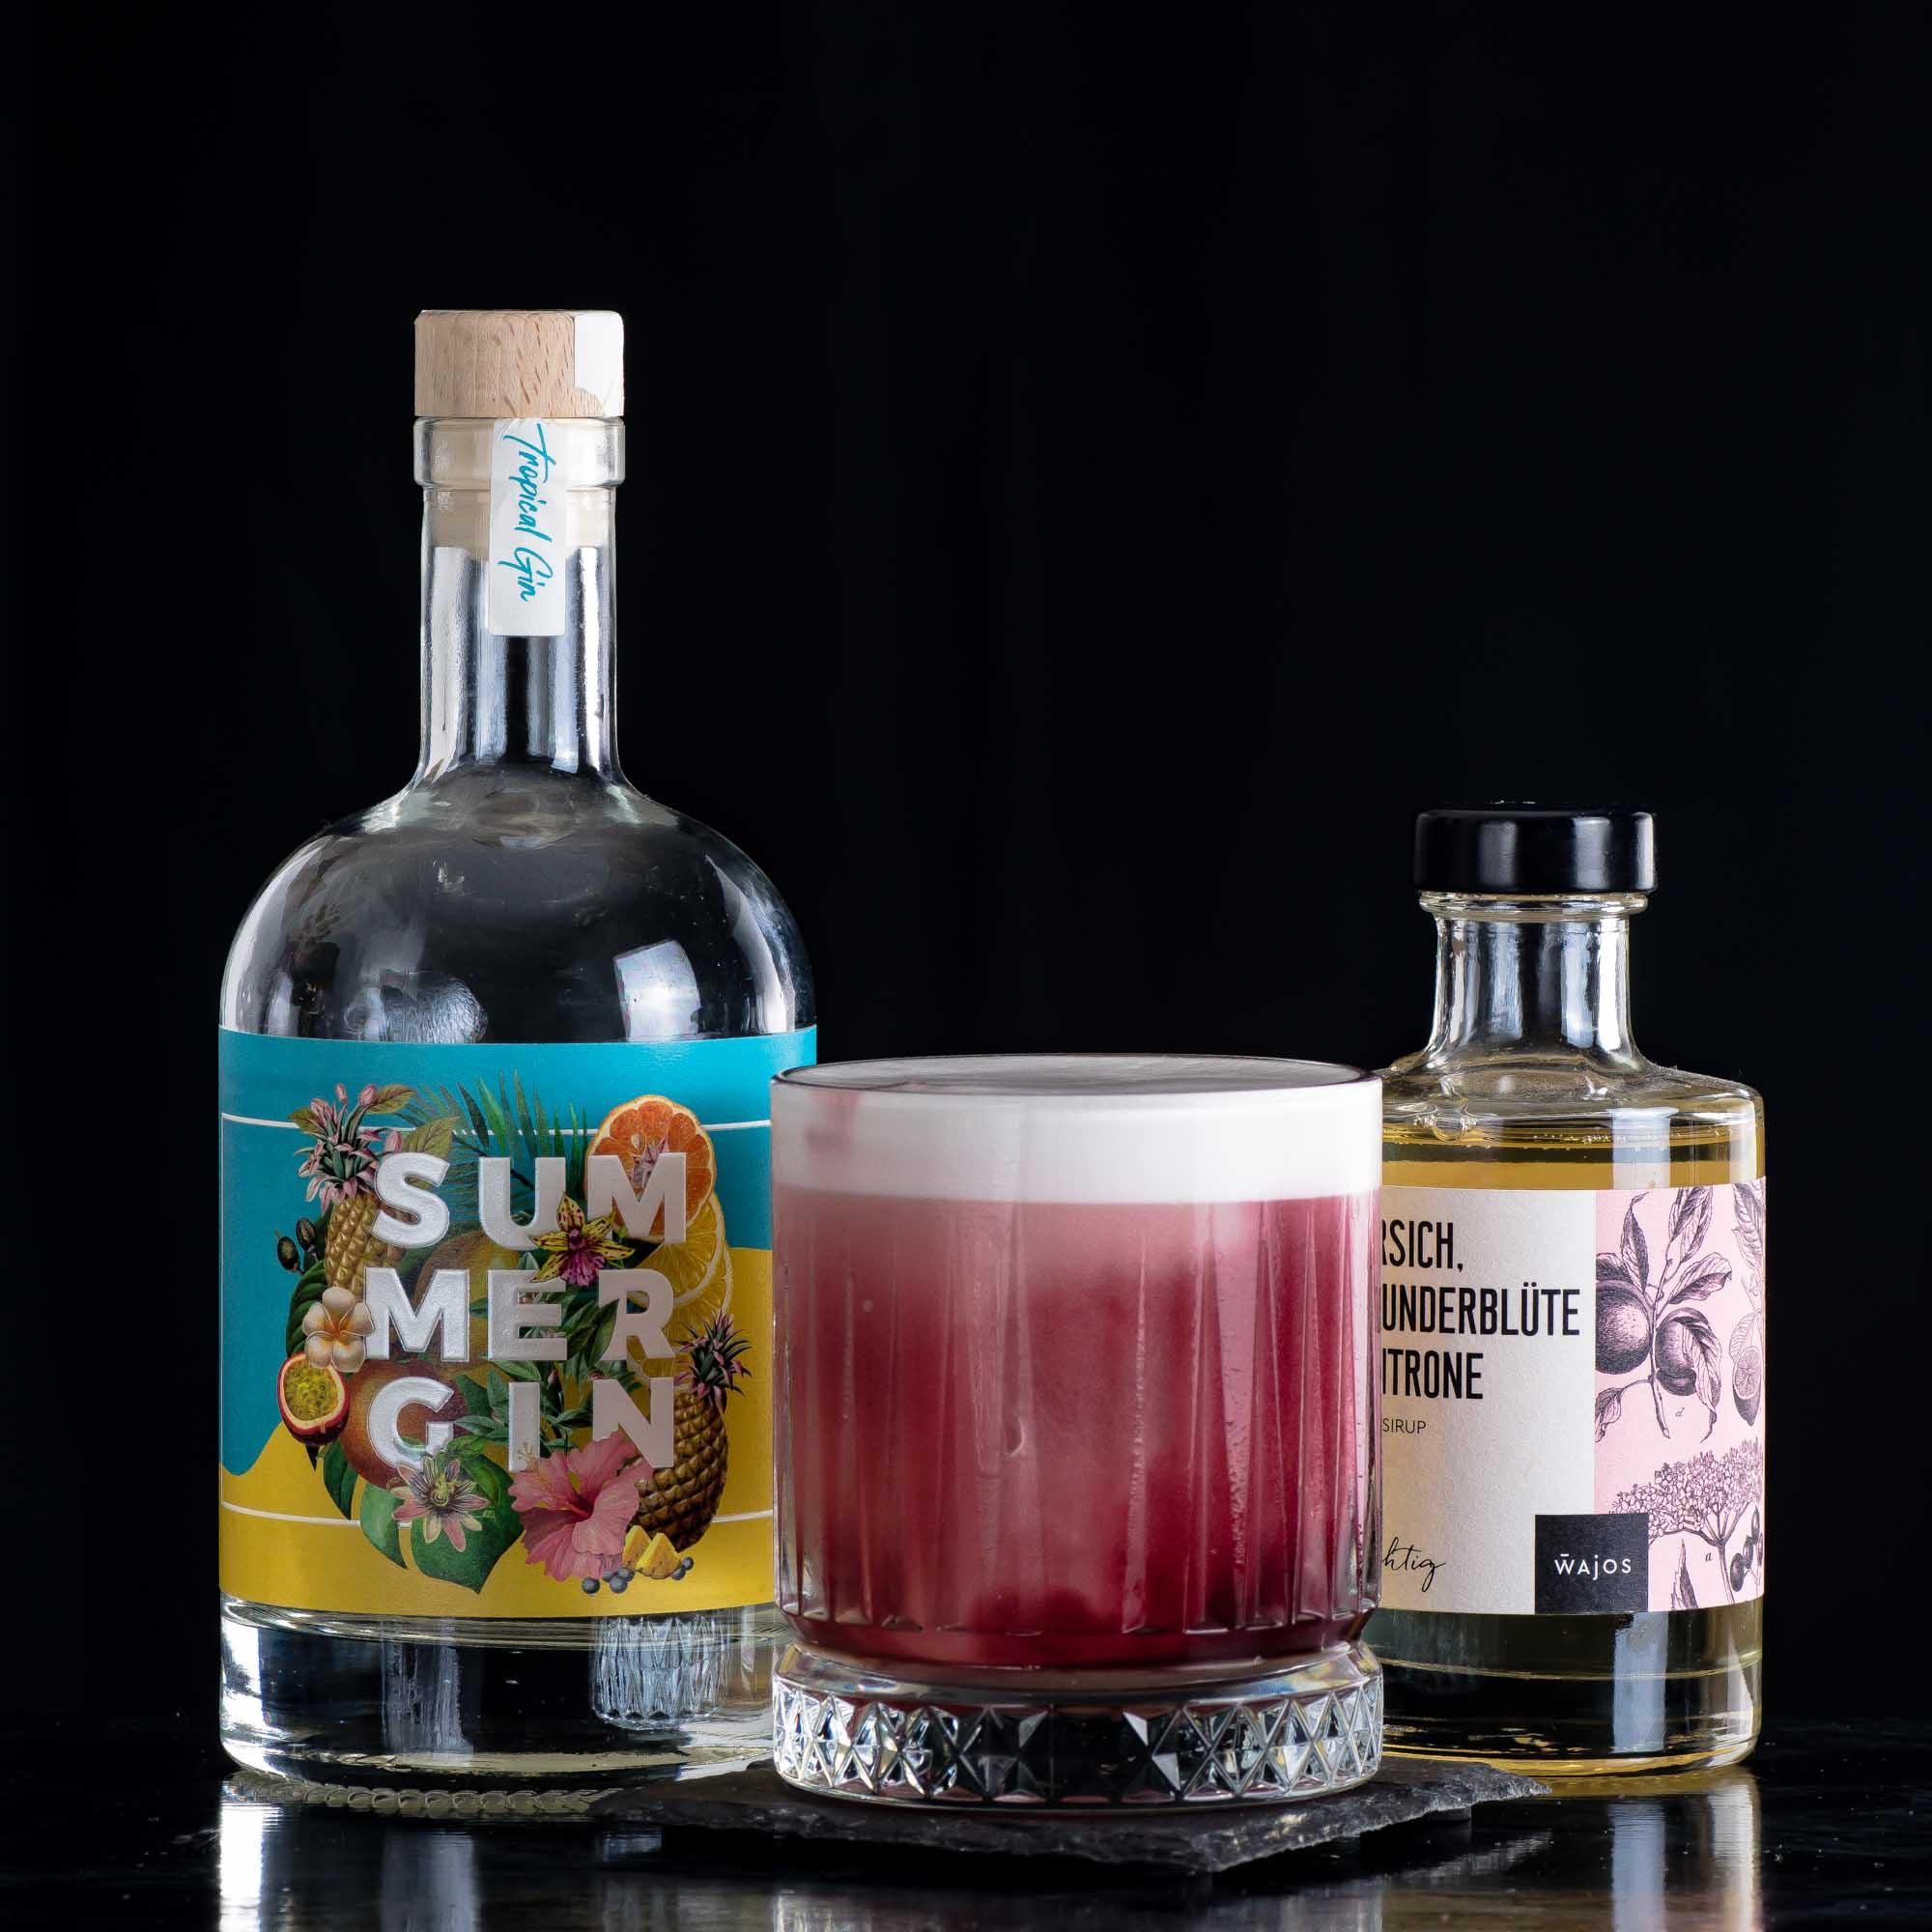 Wajos Summer Gin im Summer Moon Sour.